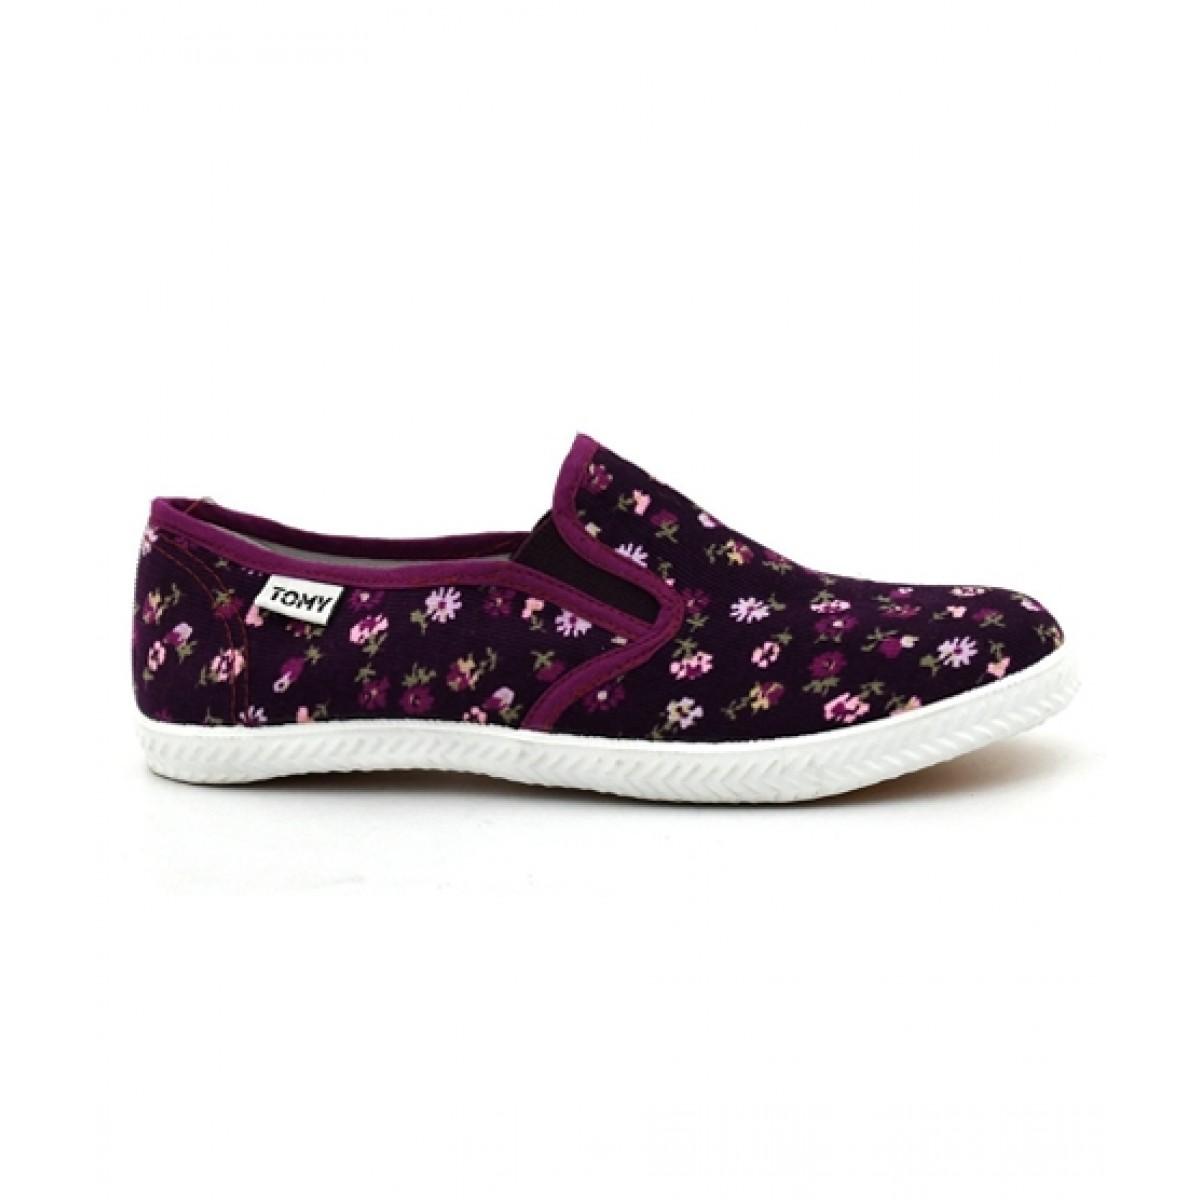 Bata Tommy Takkies Shoes For Women Purple (589-5076)